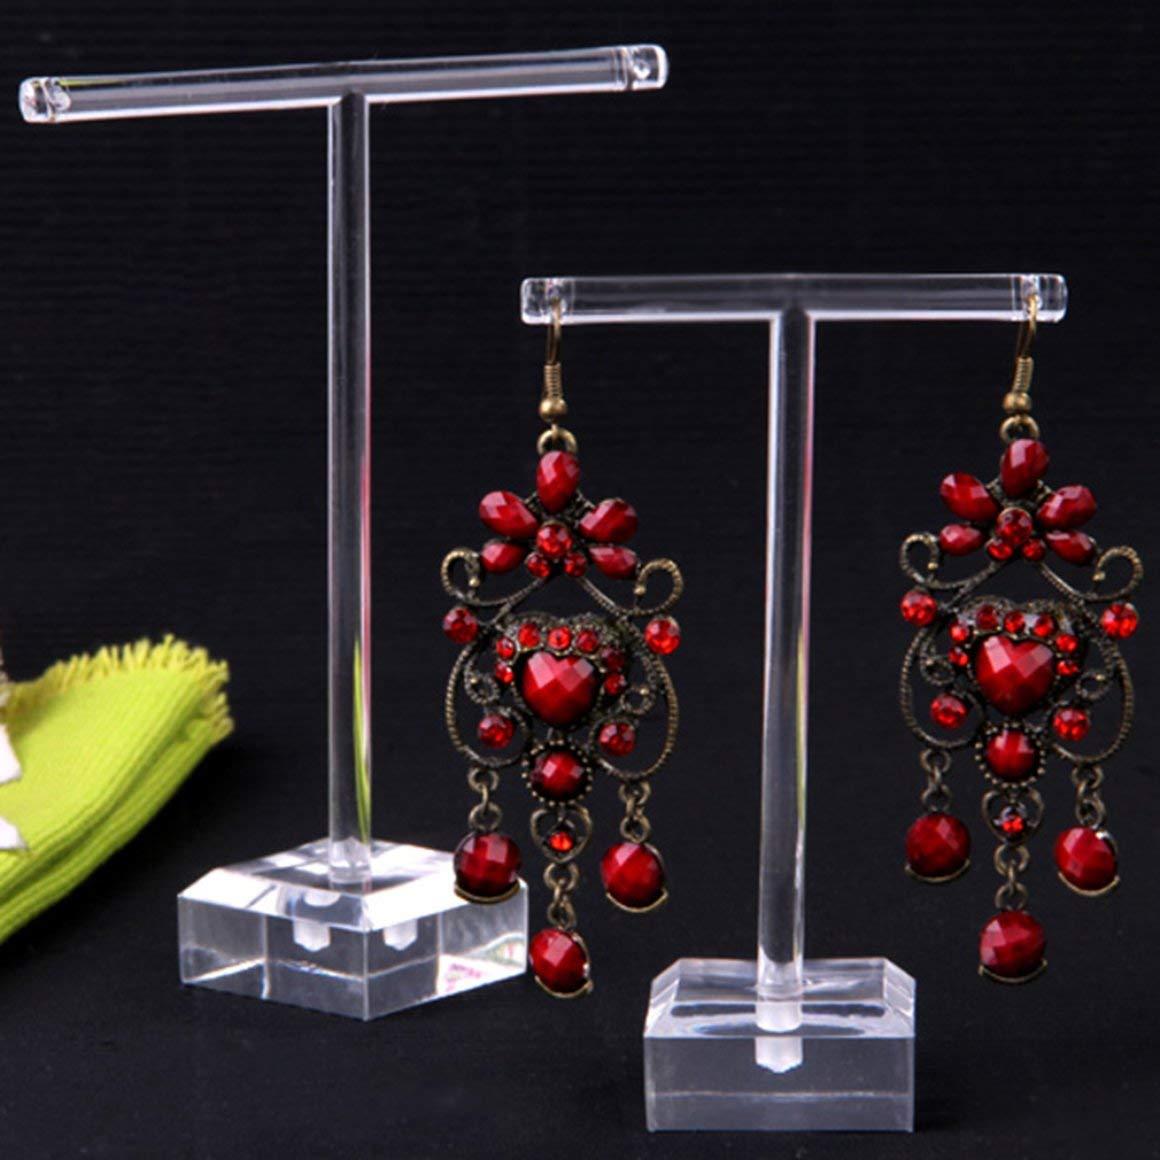 Funnyrunstore 2pcs Set Orecchini di plastica Trasparente Display vetrina T Bar Stand Holder Organizer Jewelry Hanger Display Rack Kit